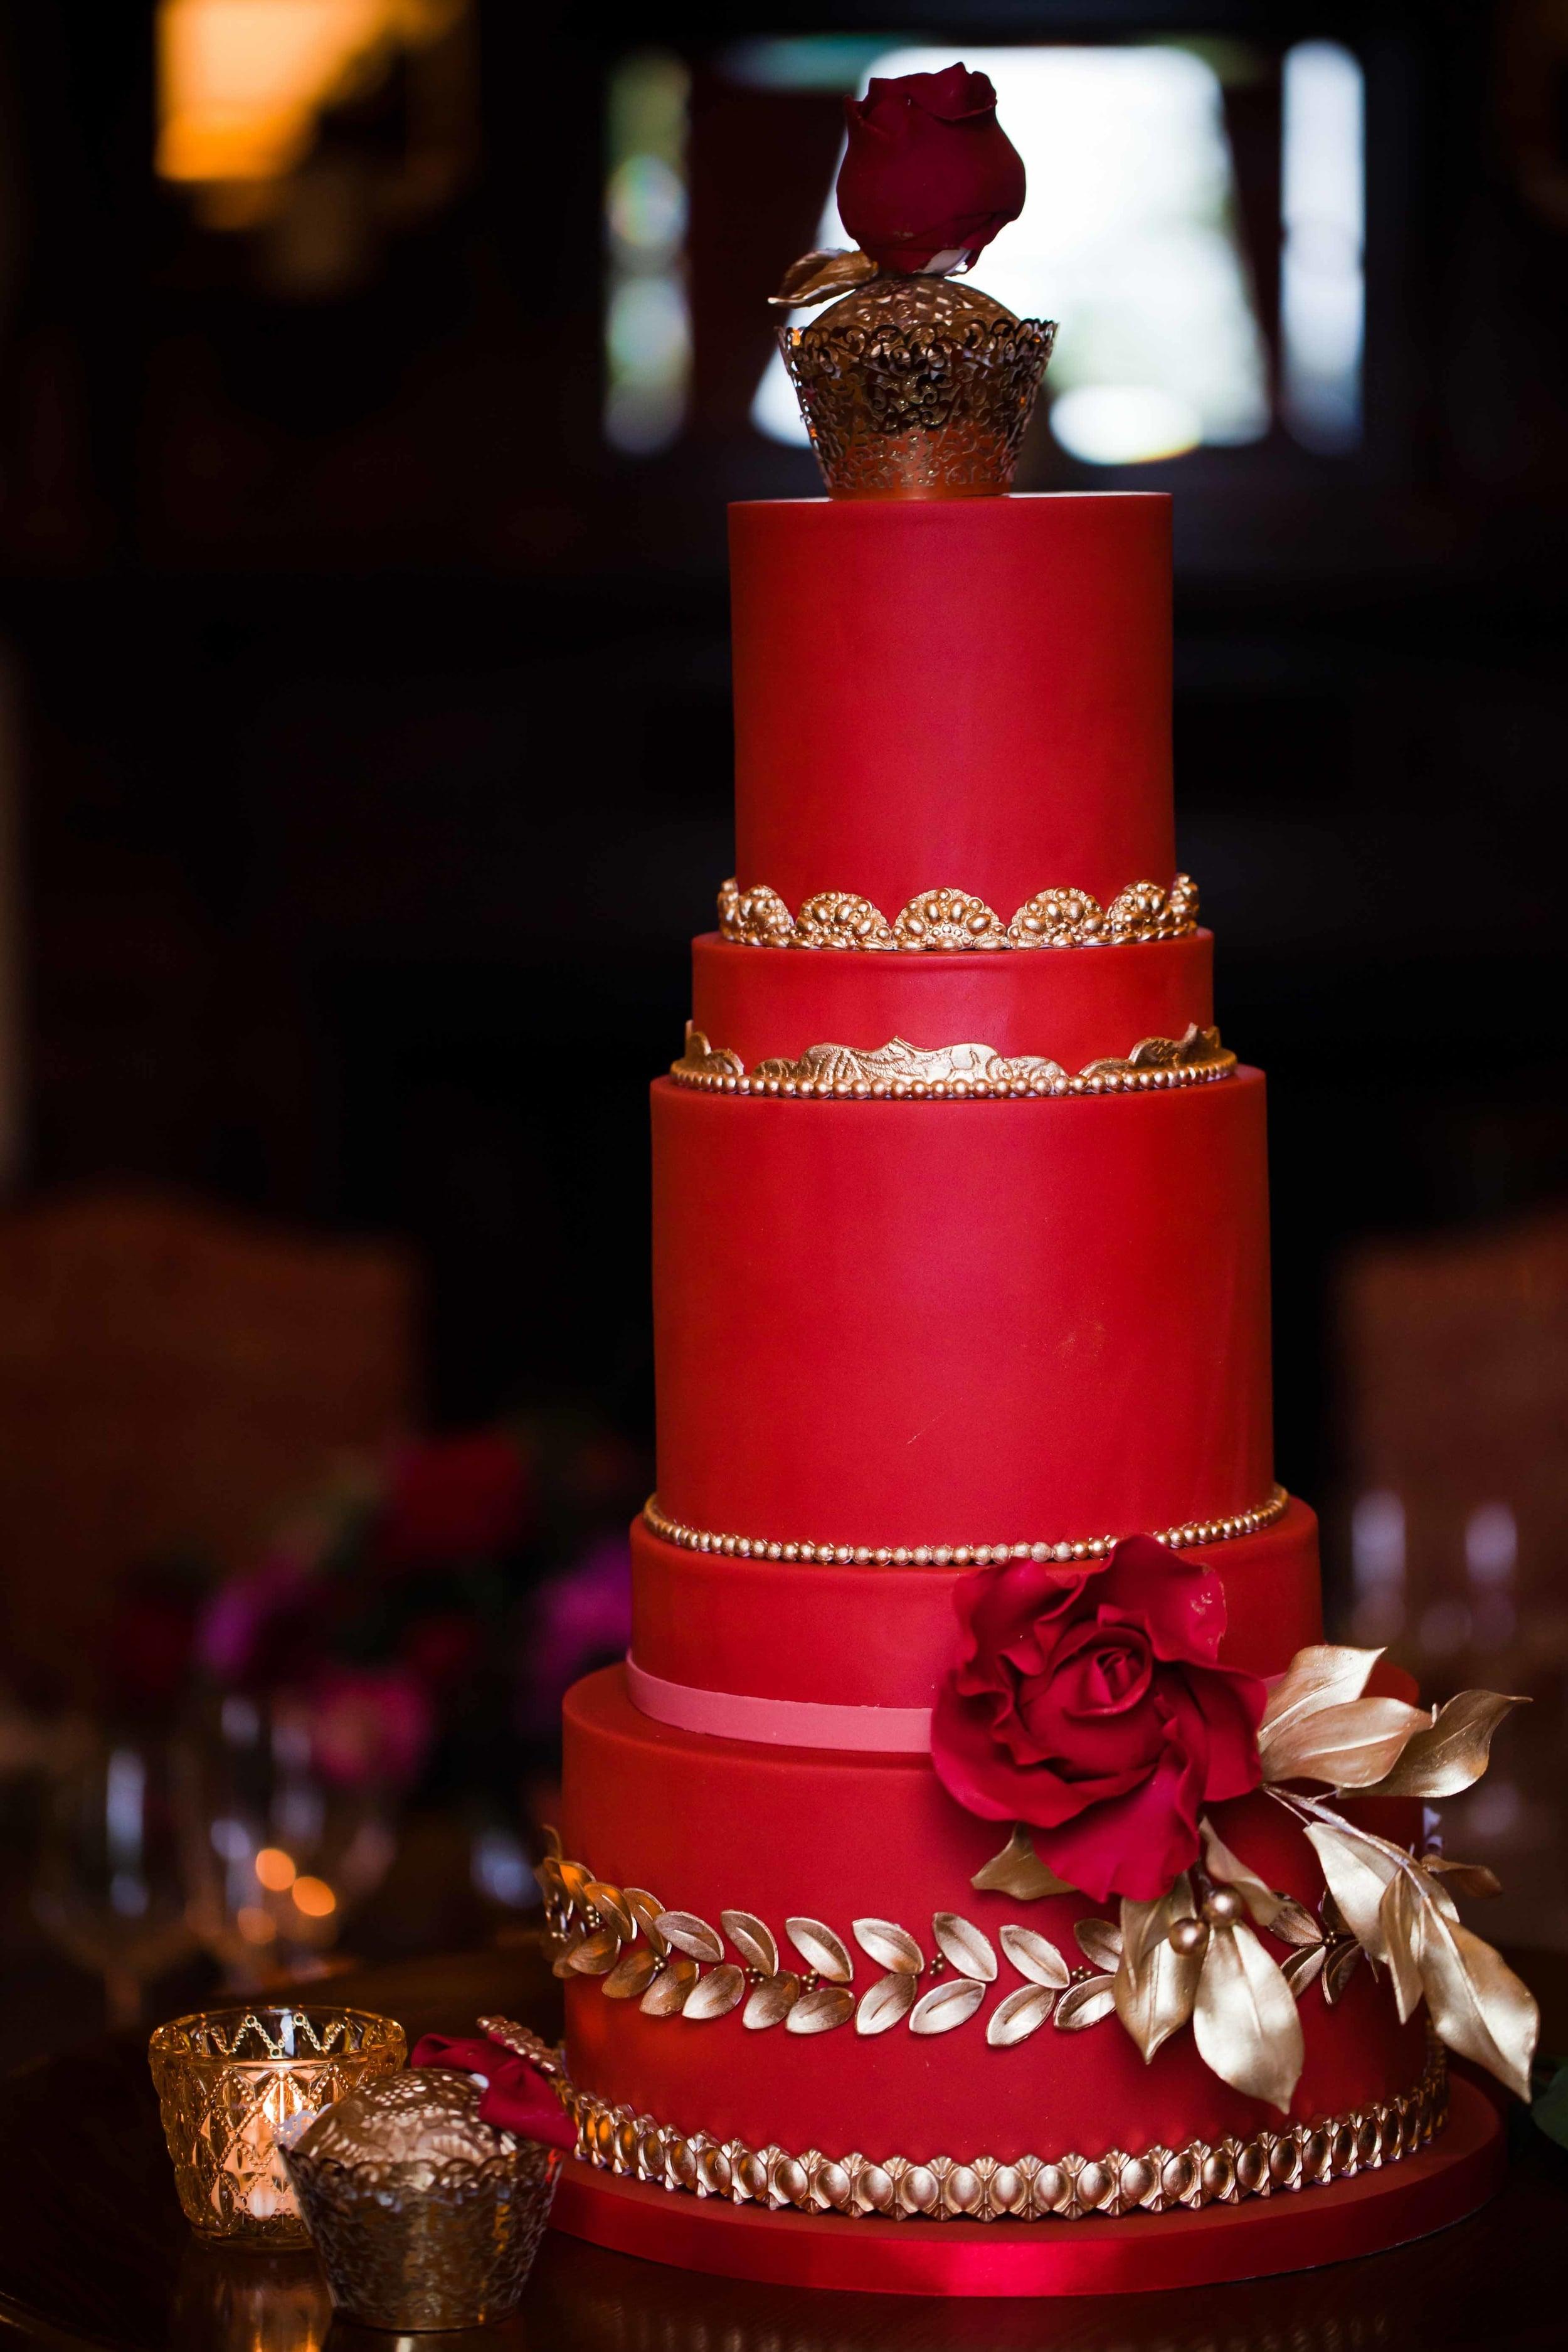 Cake by Poppy Pickering cakes